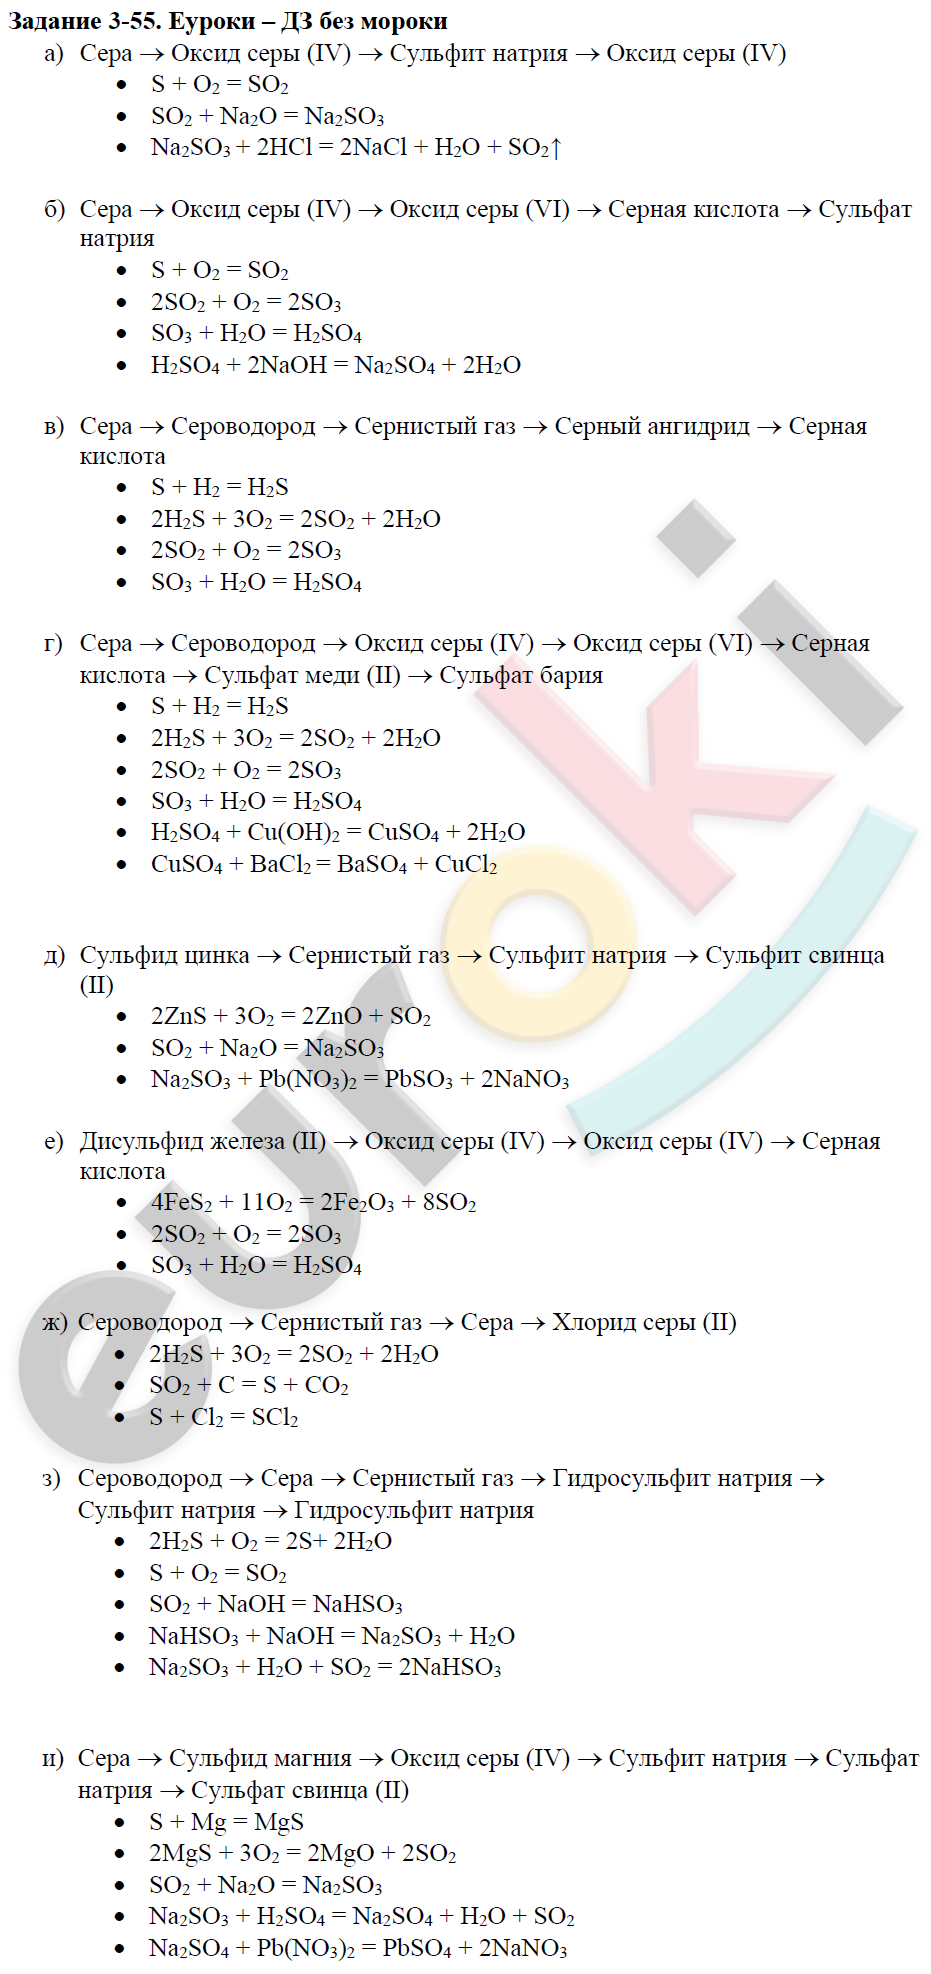 Решебник по химии 9 класс кузнецова левкин